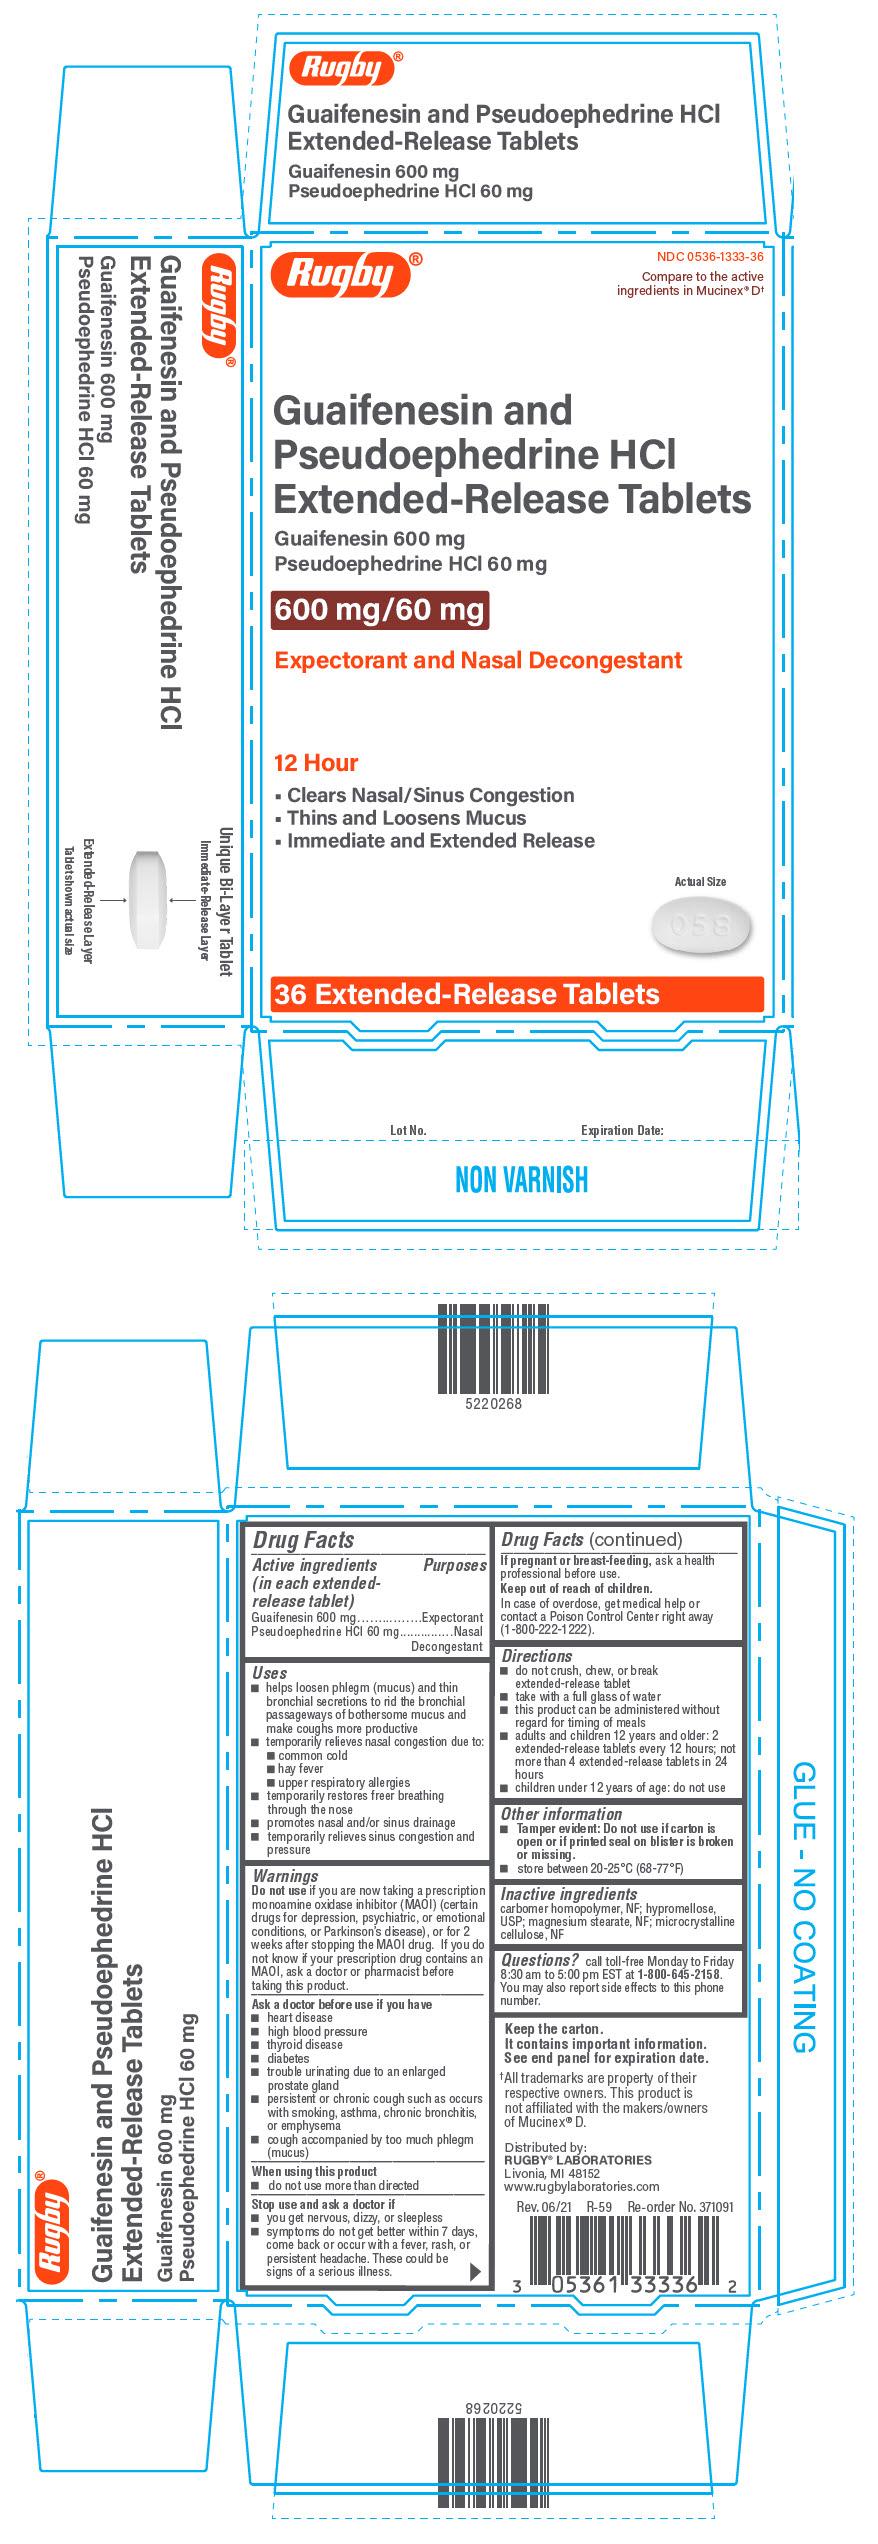 PRINCIPAL DISPLAY PANEL - 36 Tablet Blister Pack Carton